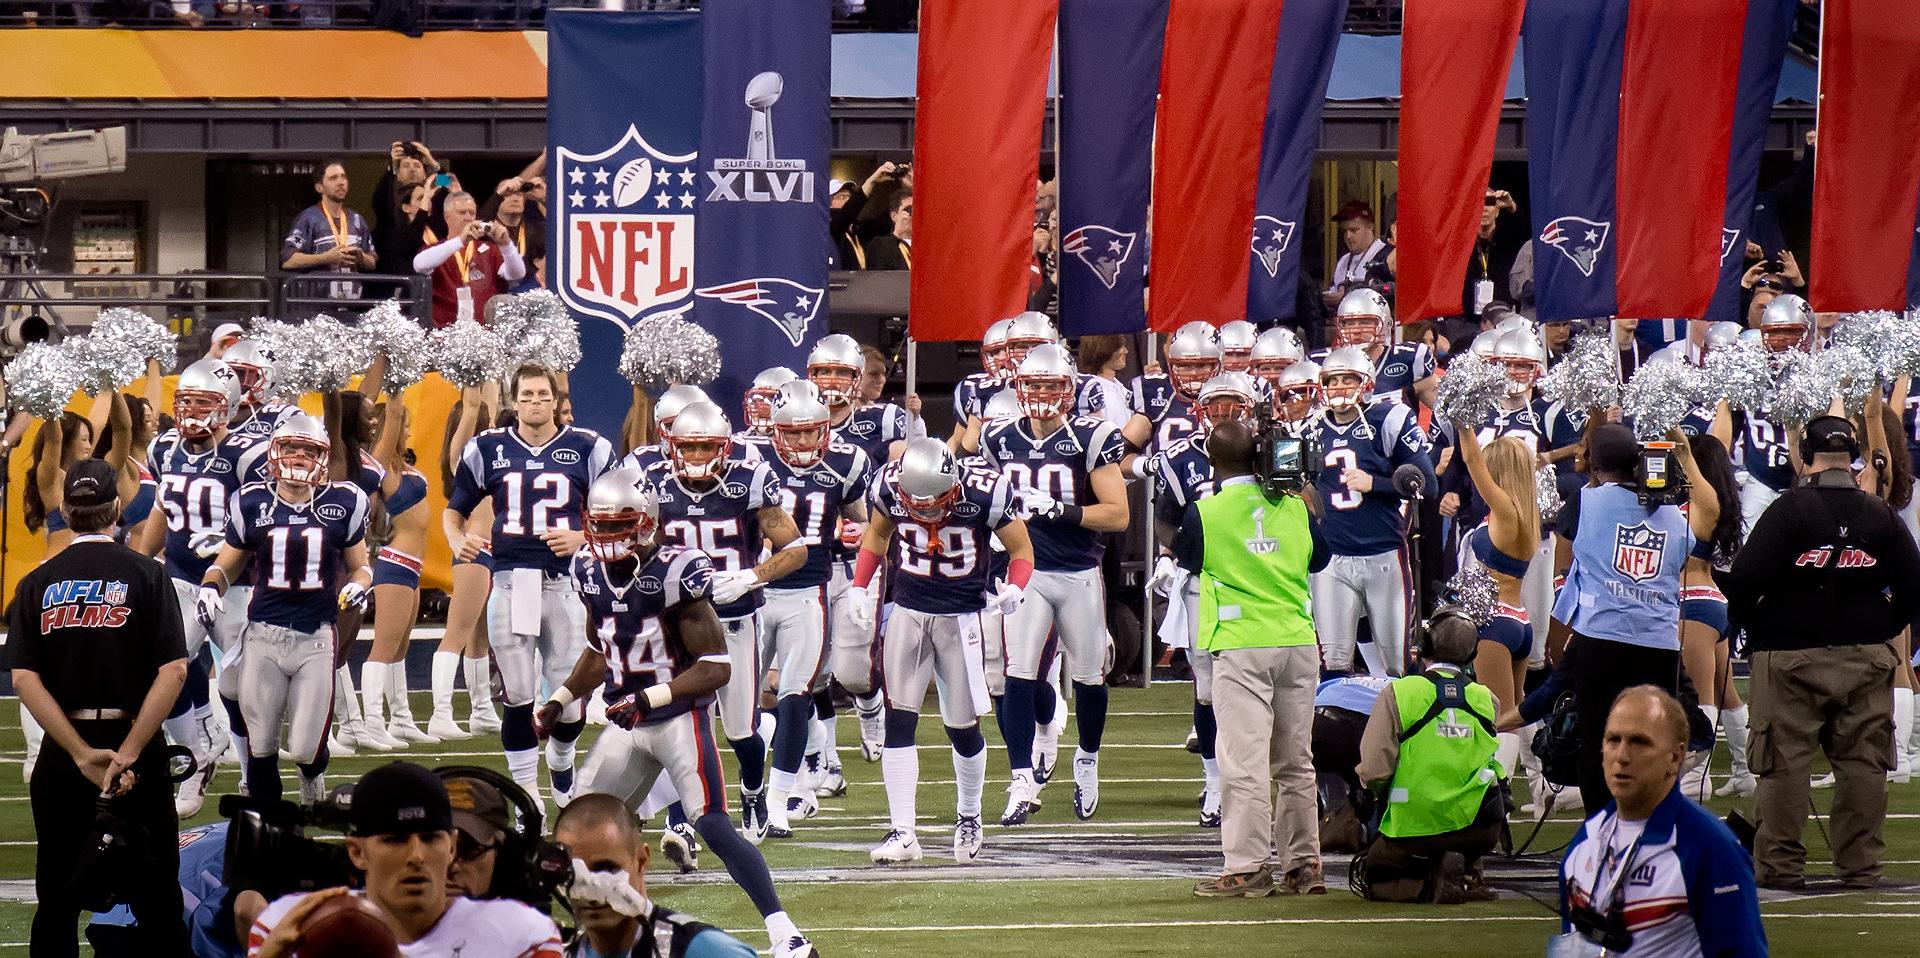 File:New England Patriots grand entrance (6837538261).jpg - Wikimedia Commons